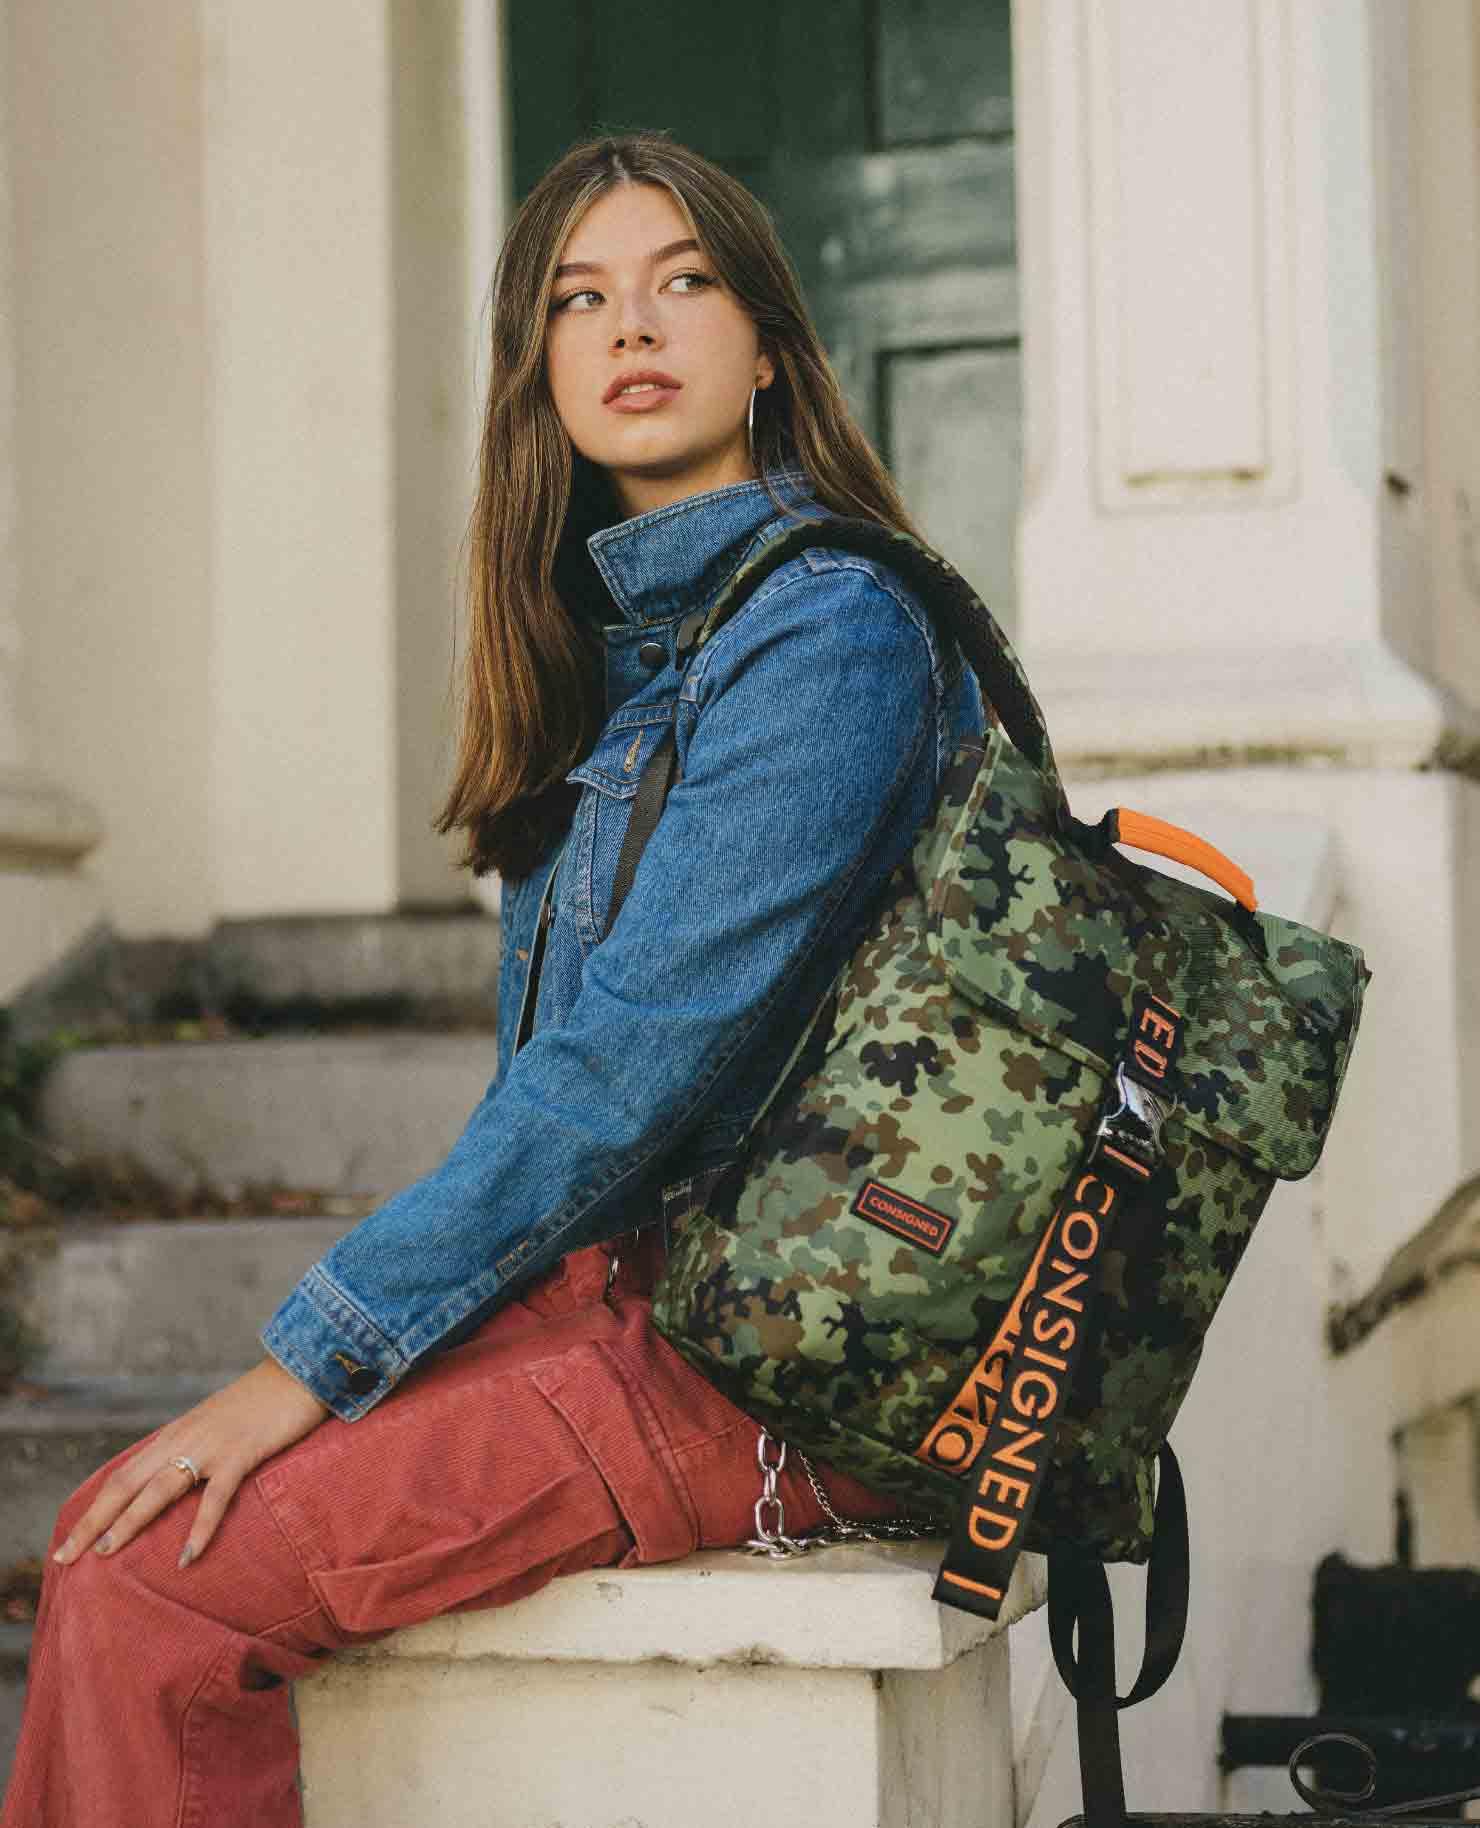 Ceara Maya Modeling The Helt Zane Backpack In Camo